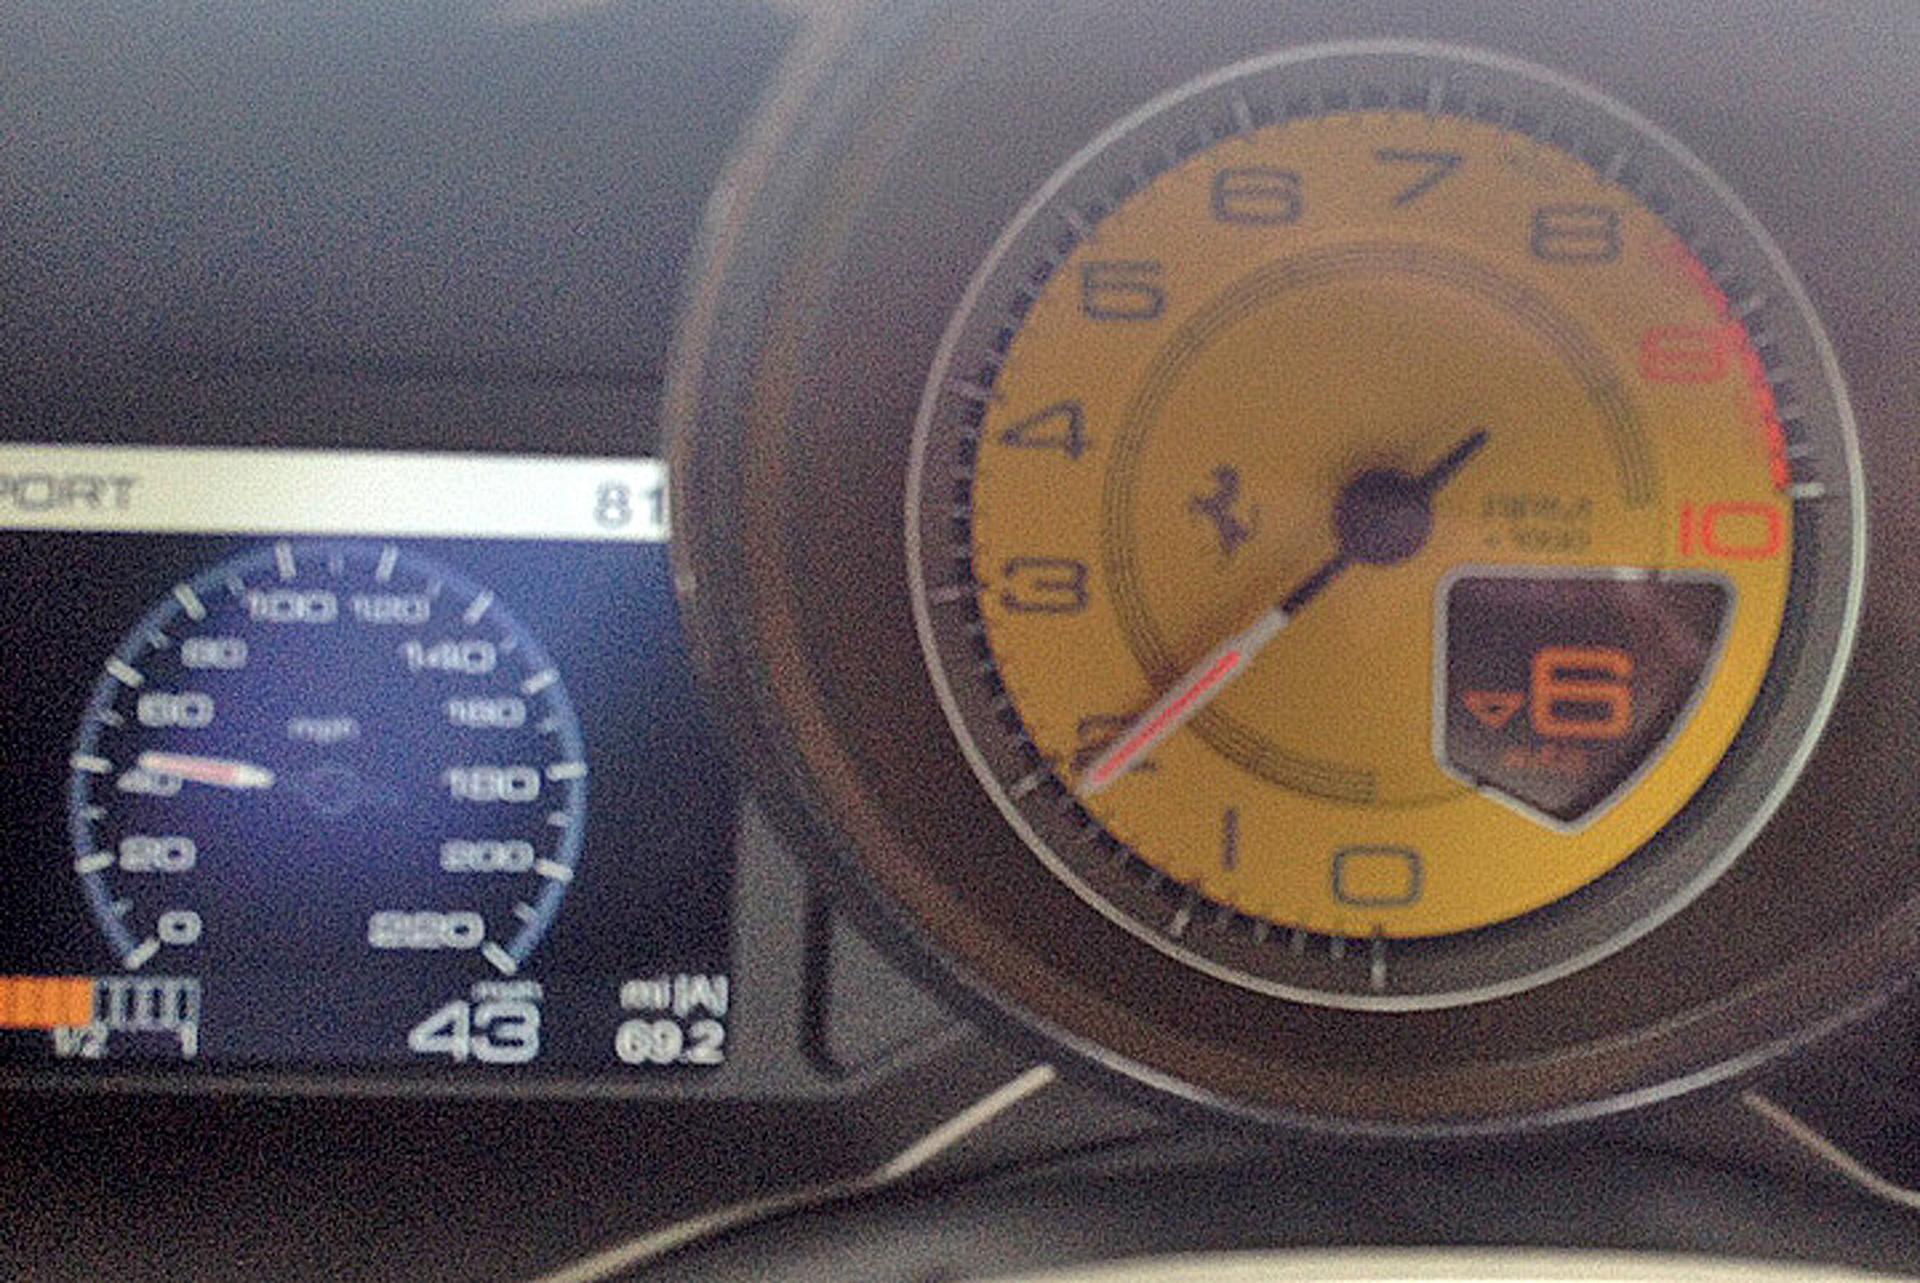 5 Reasons Why We Don't Love the Ferrari F12berlinetta